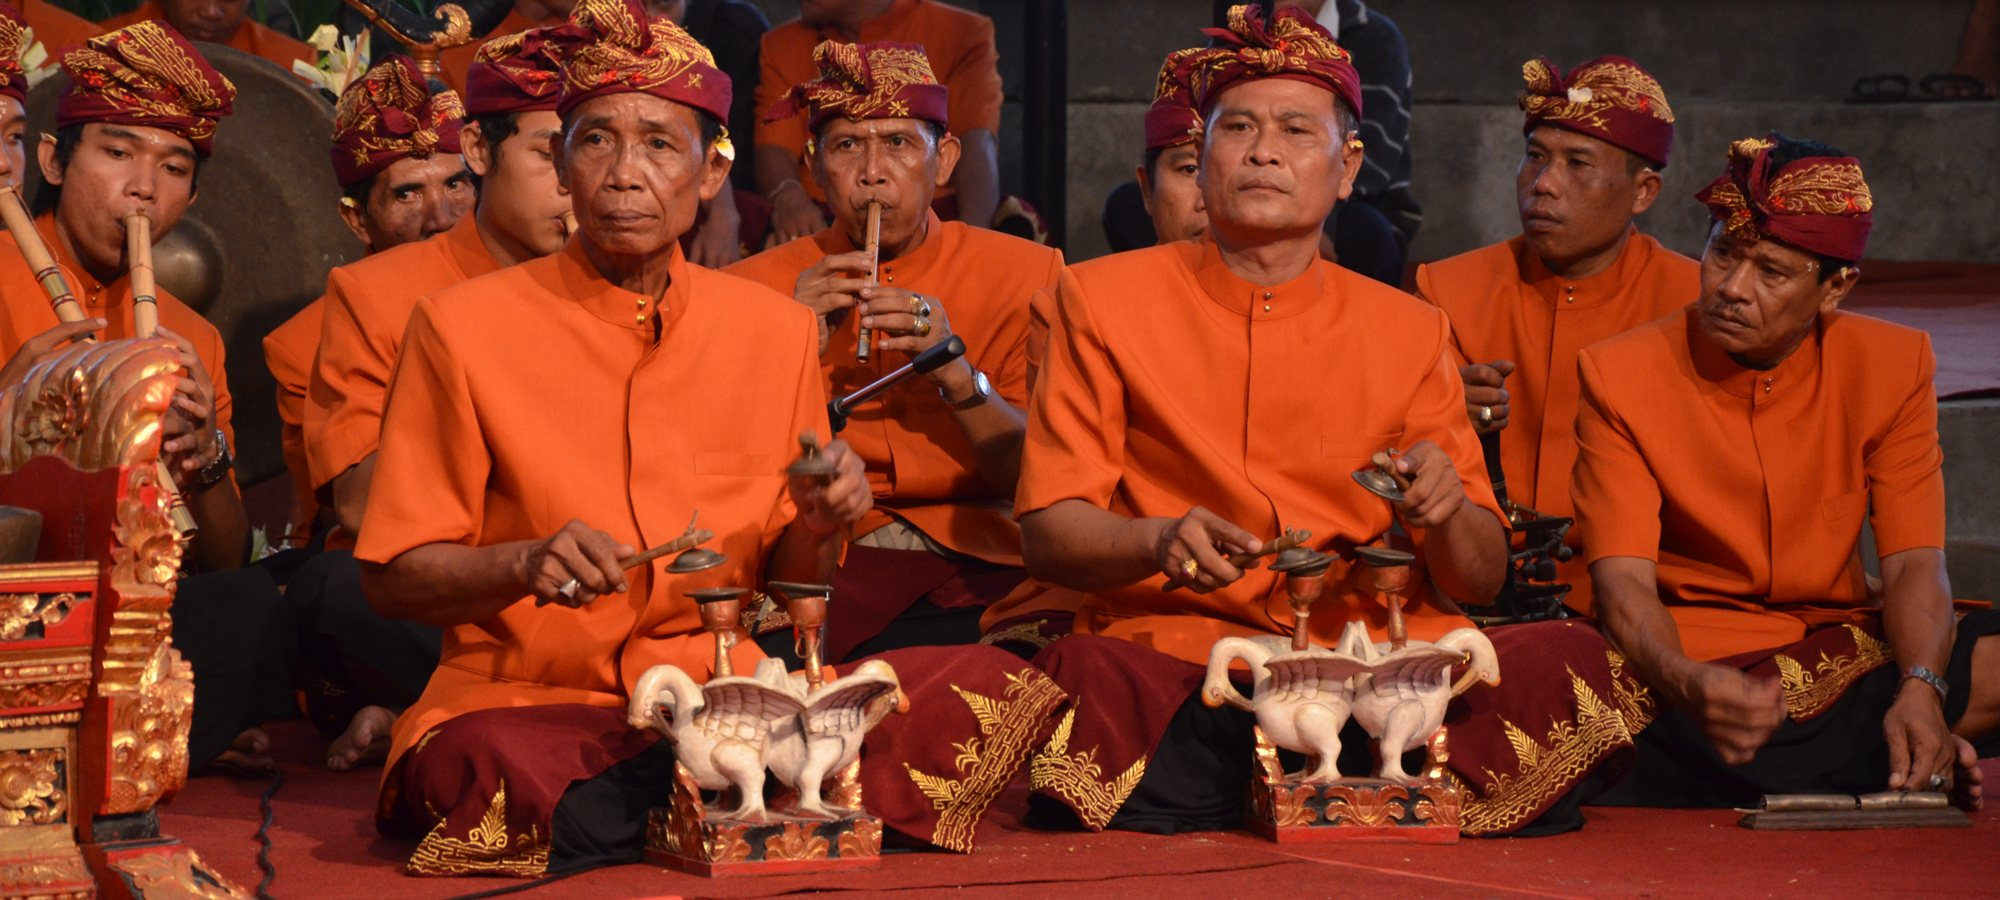 Indonesian men playing music